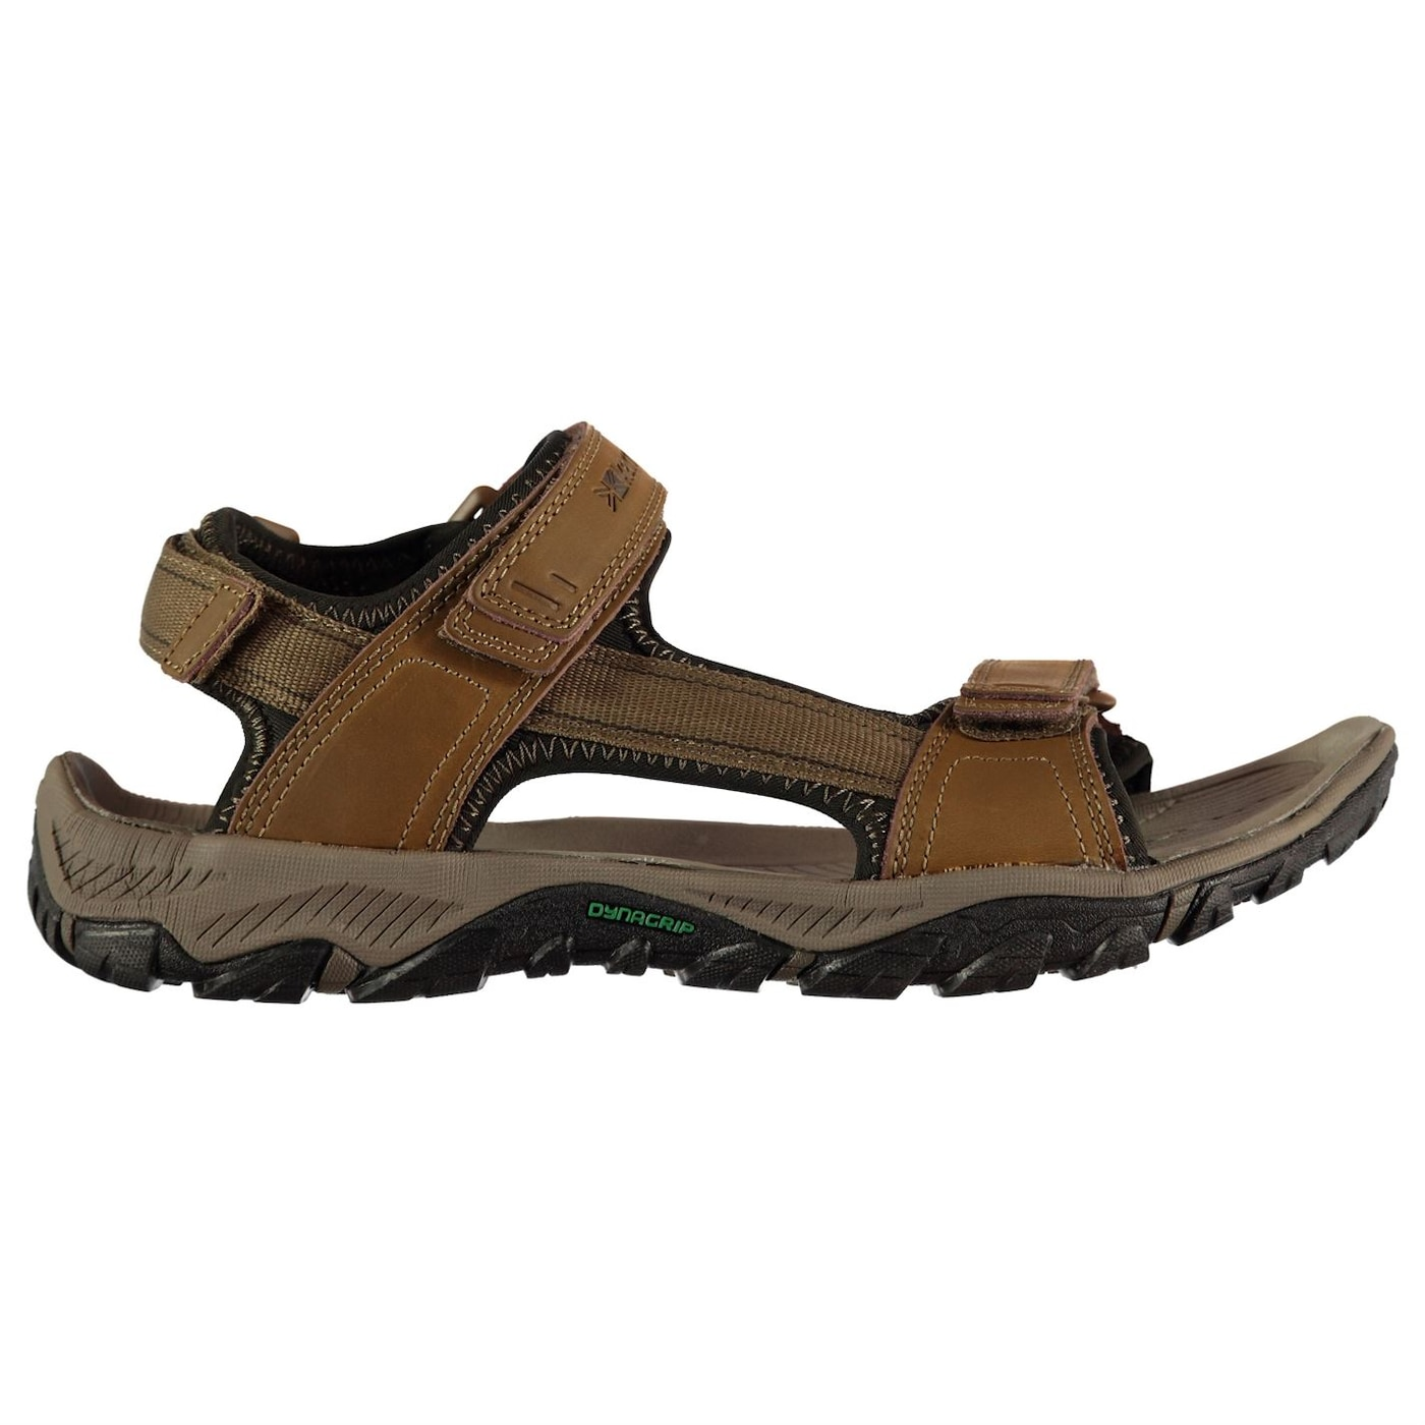 Karrimor Nihoa pánske sandále